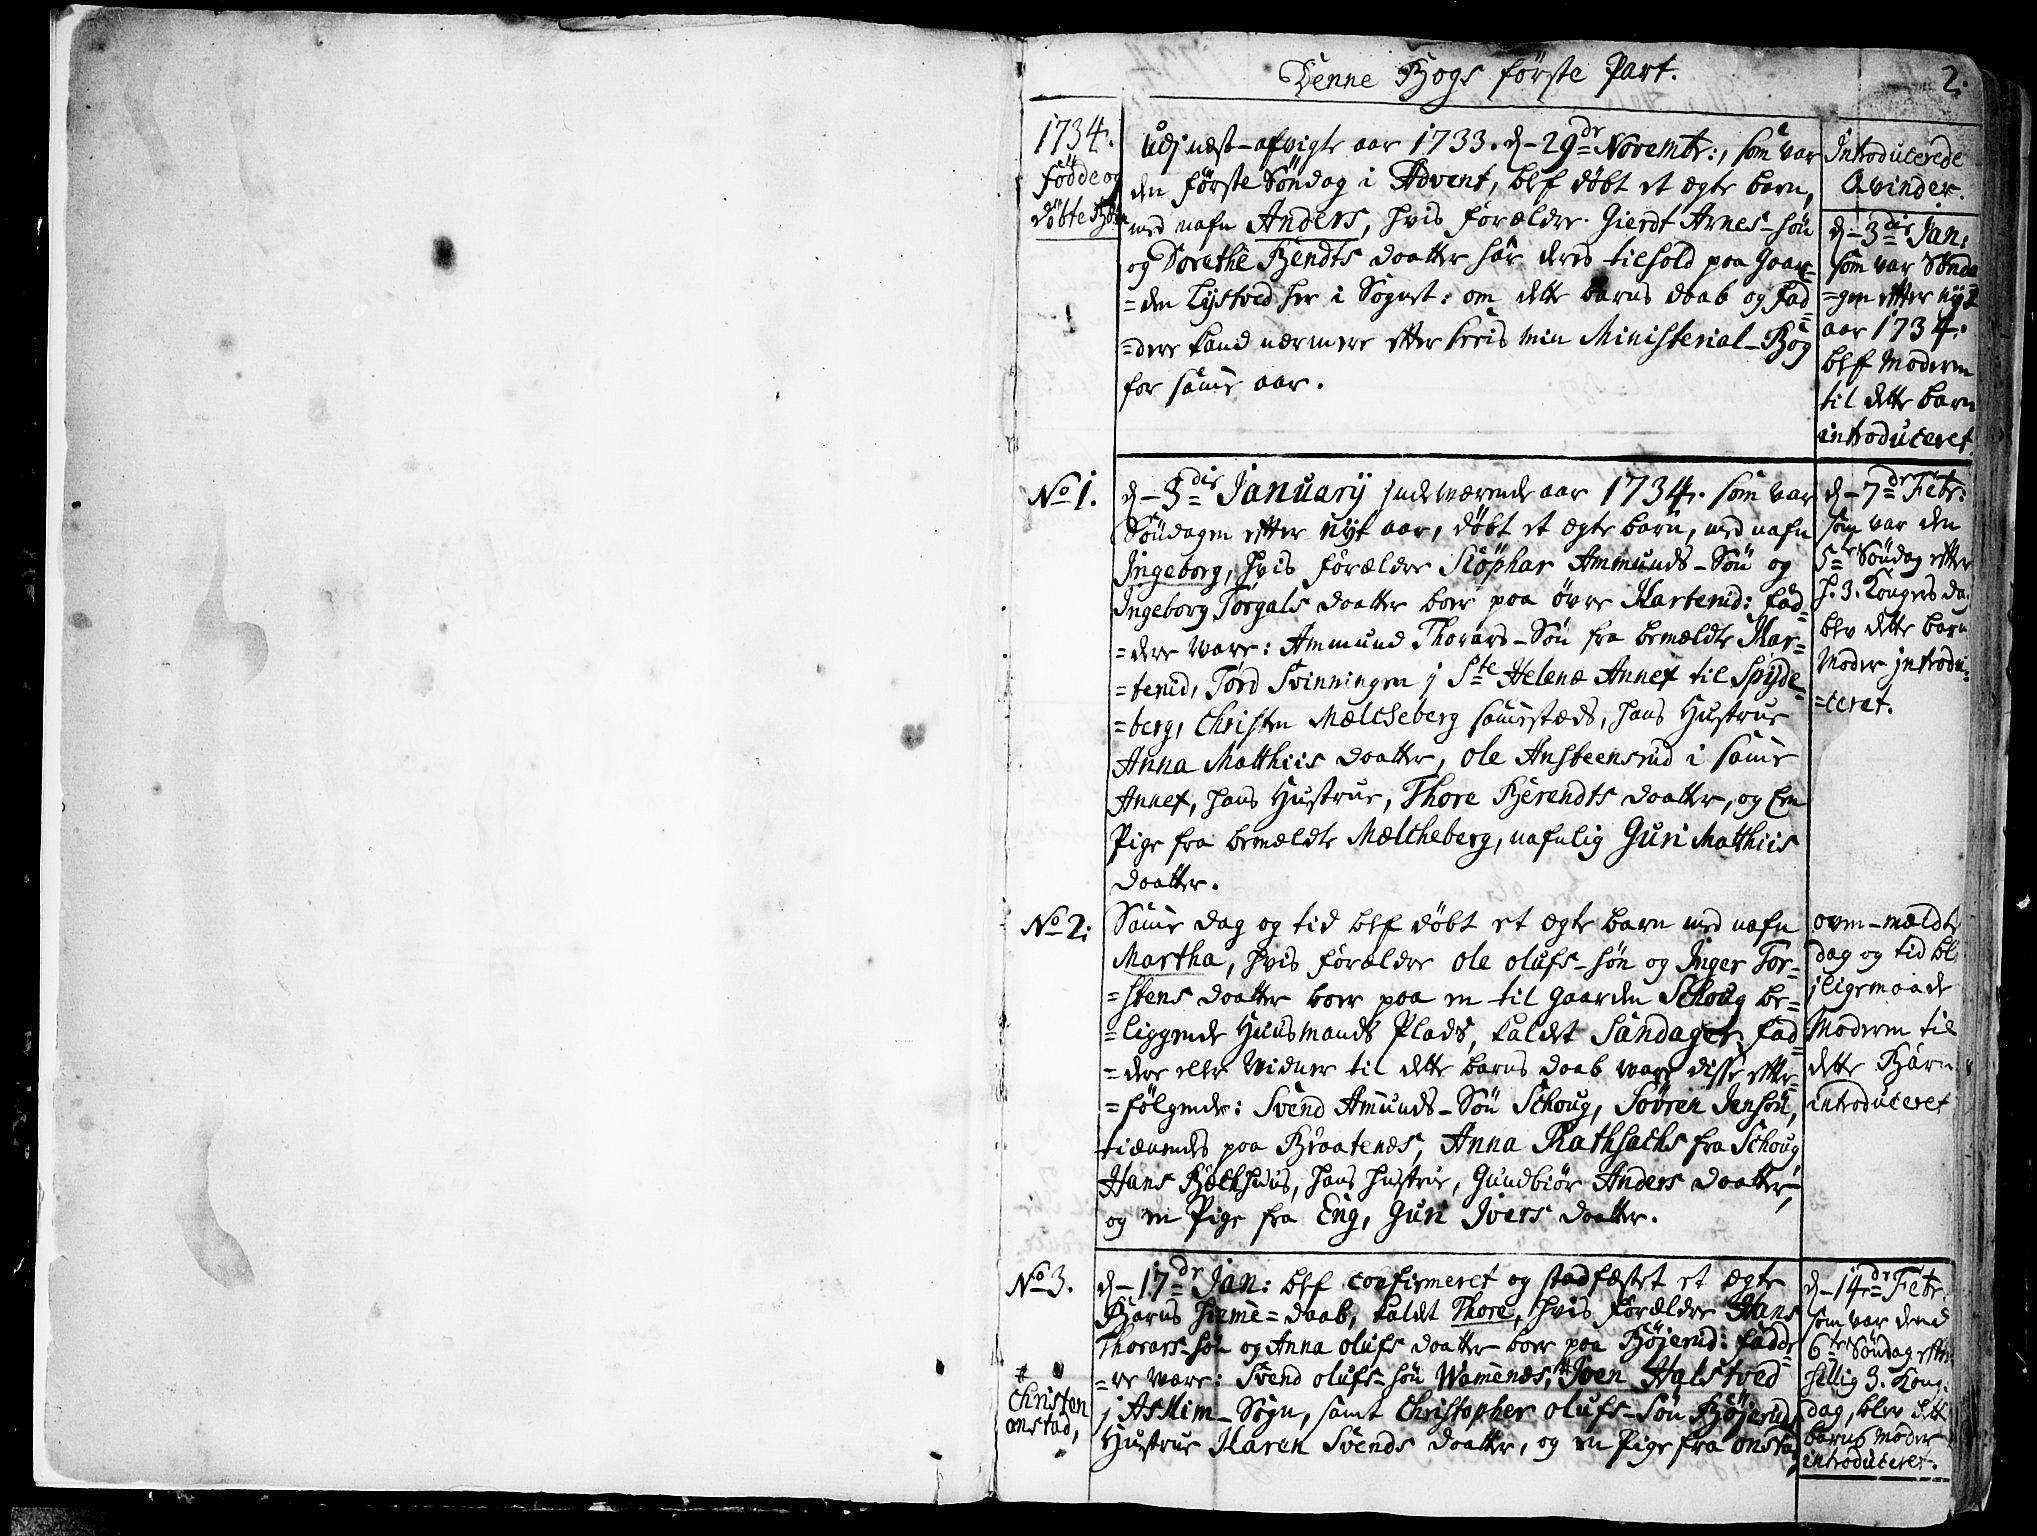 SAO, Skiptvet prestekontor Kirkebøker, F/Fa/L0002: Ministerialbok nr. 2, 1734-1759, s. 2